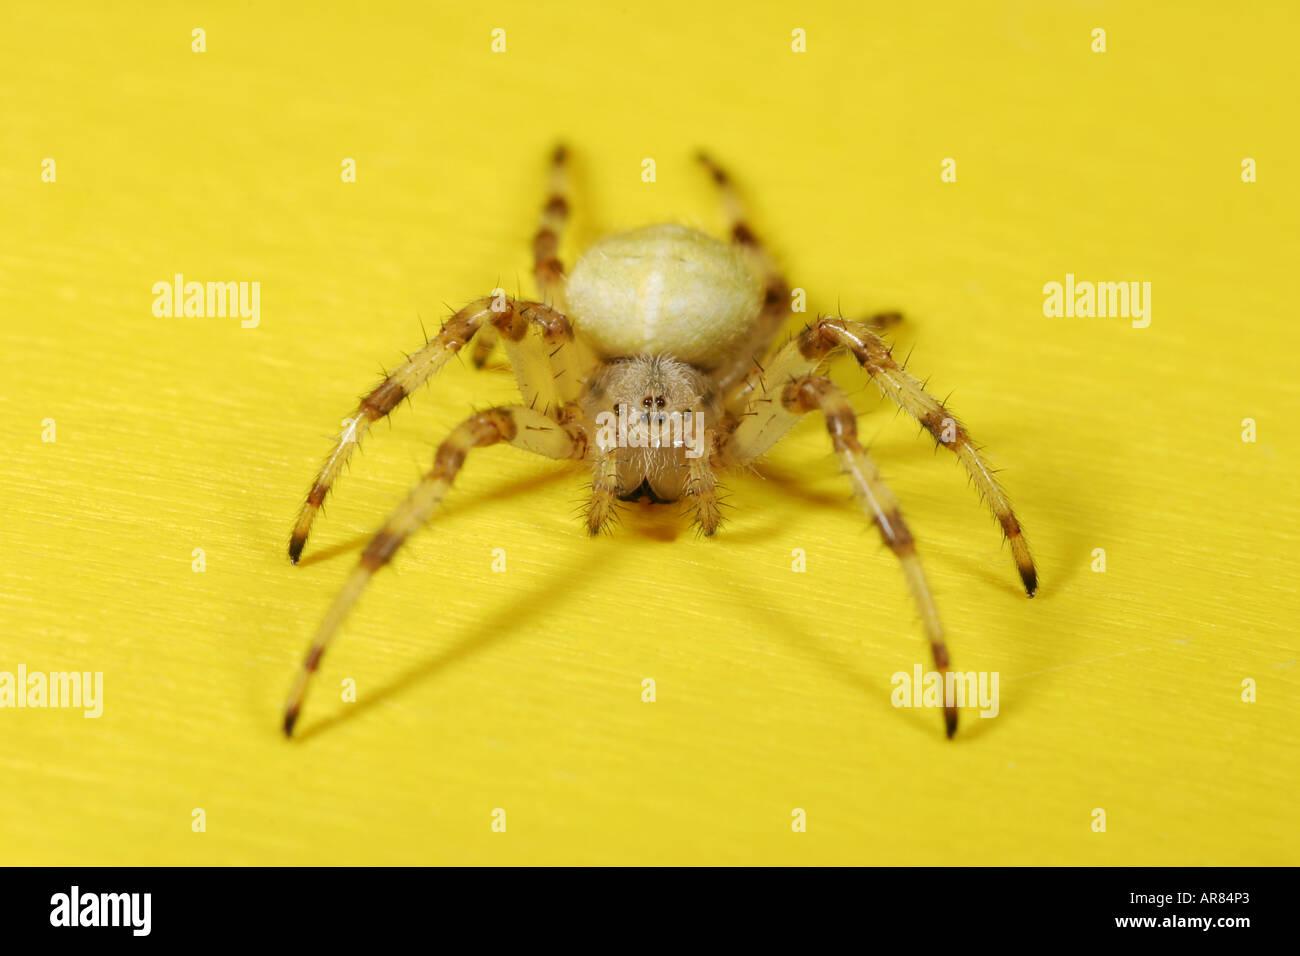 Araneus Quadratus spider on yellow background Stock Photo